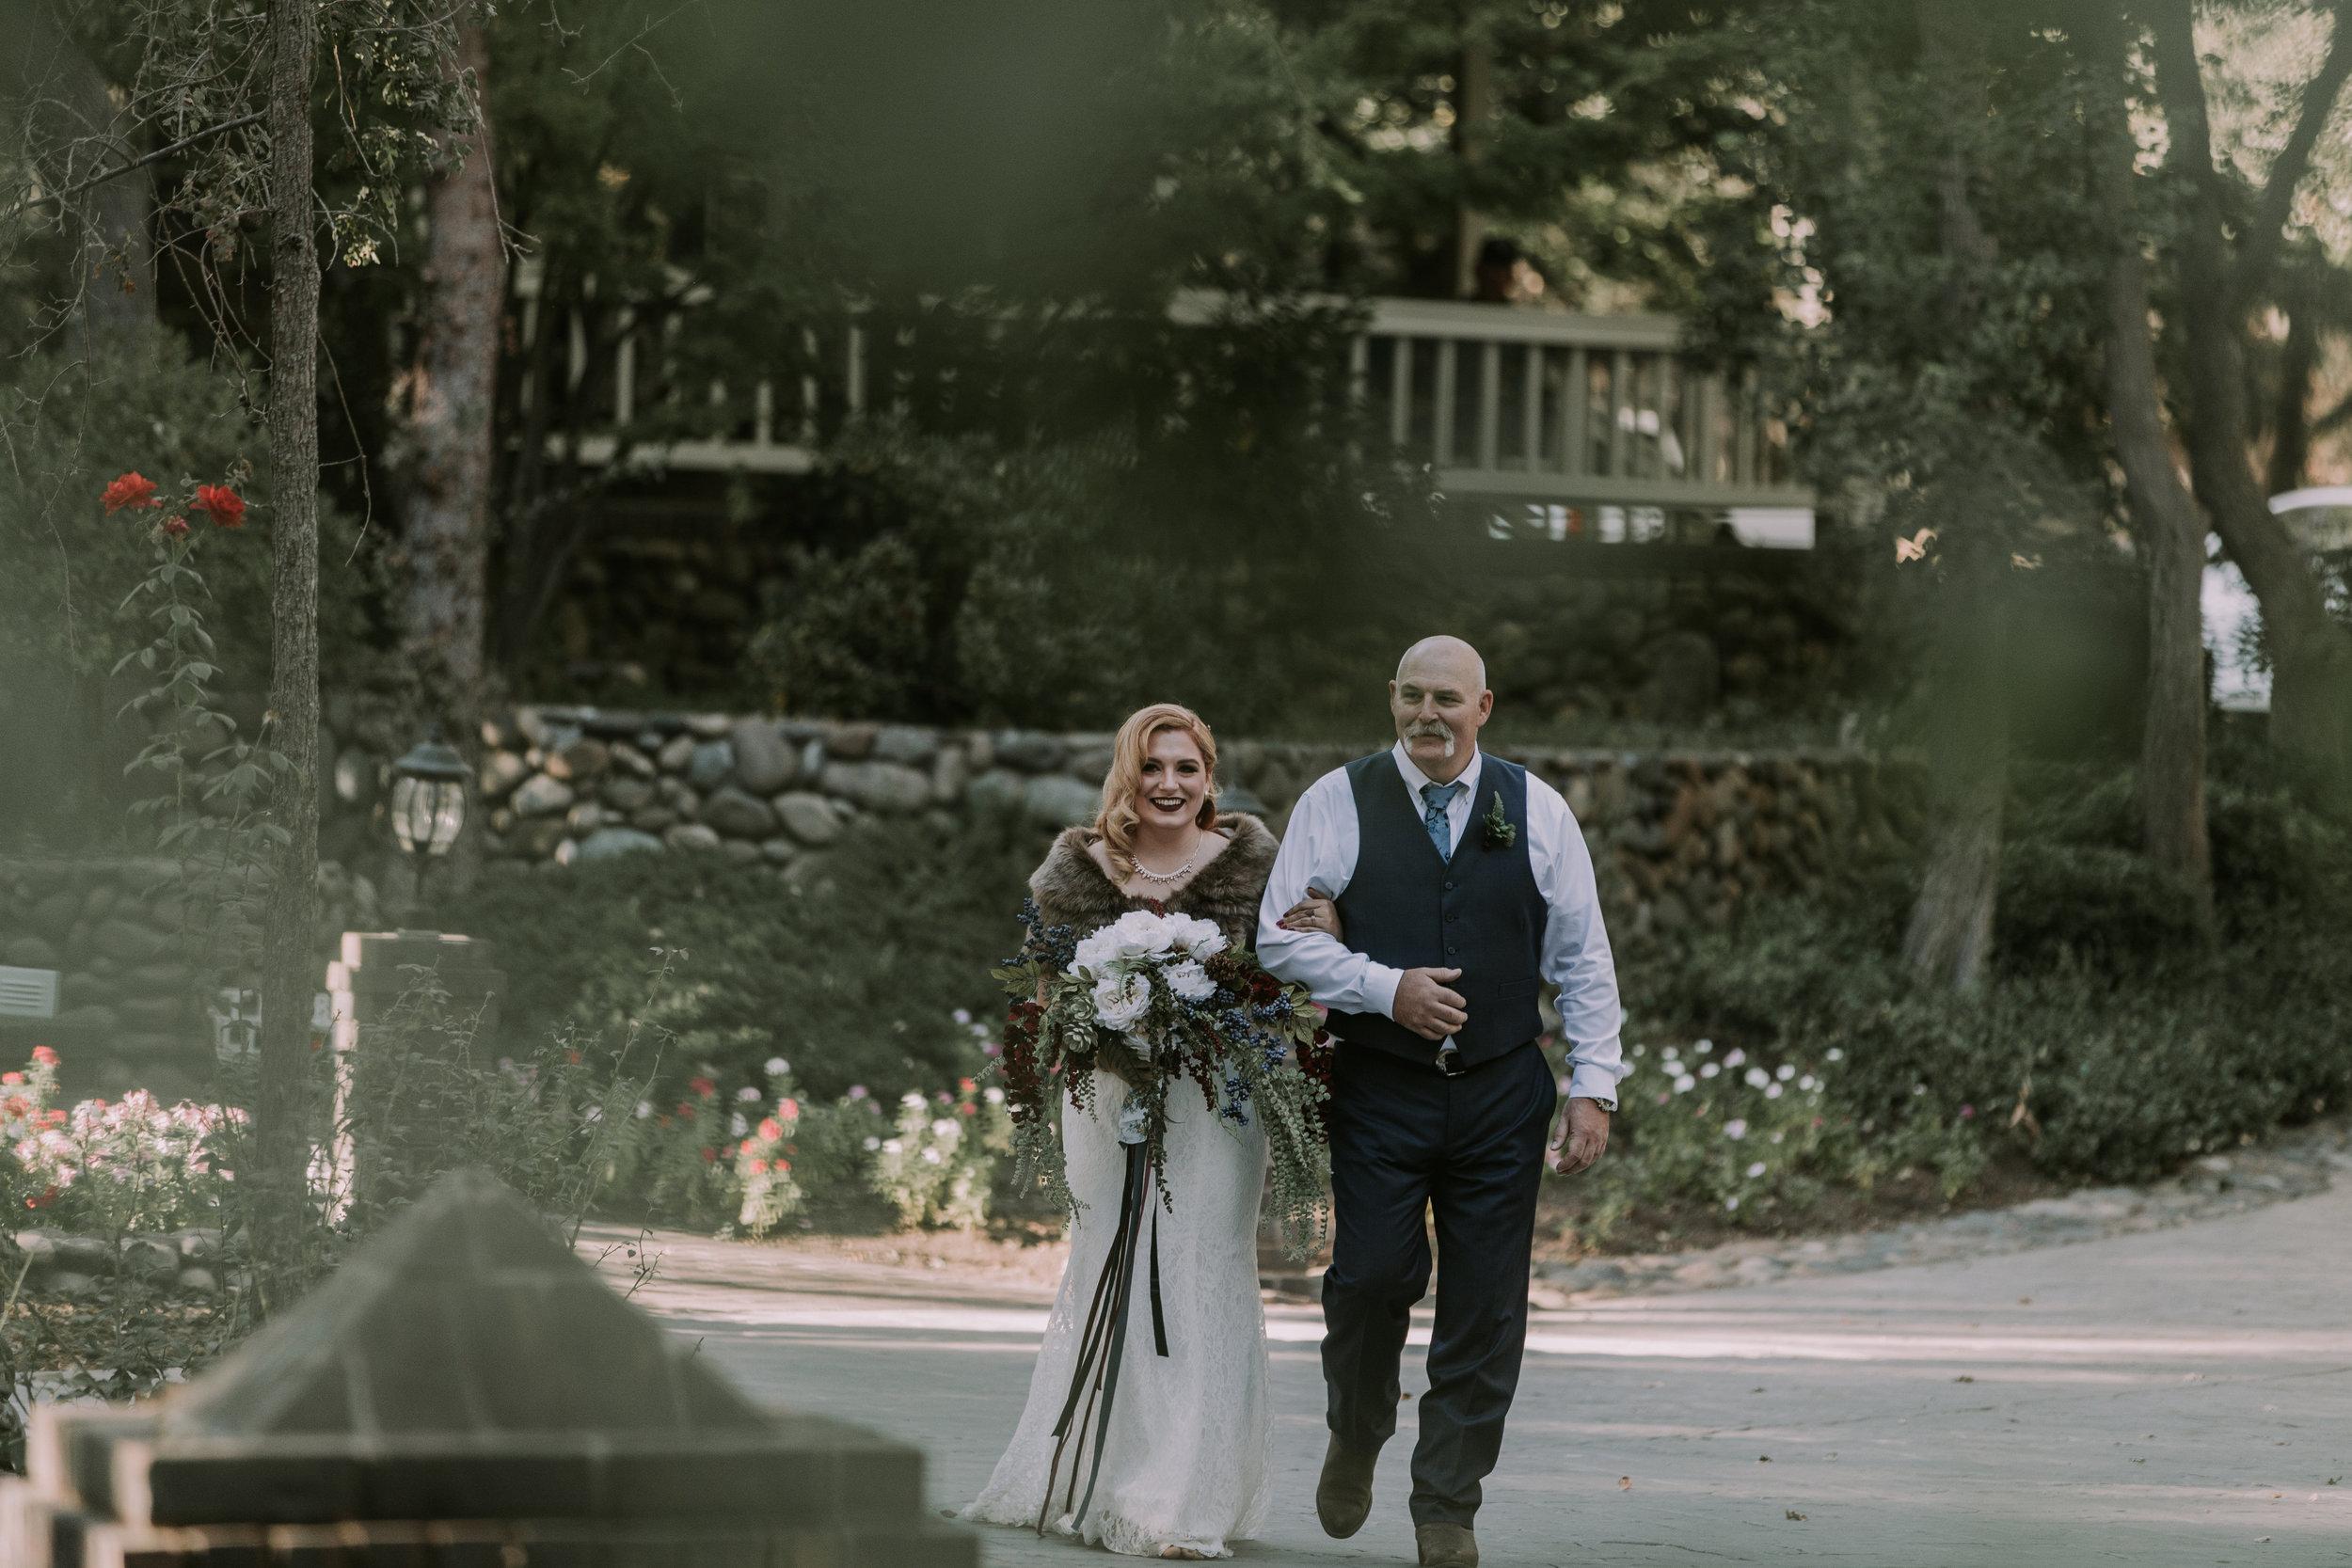 Worland Wedding 2017-Ceremony-0136.jpg